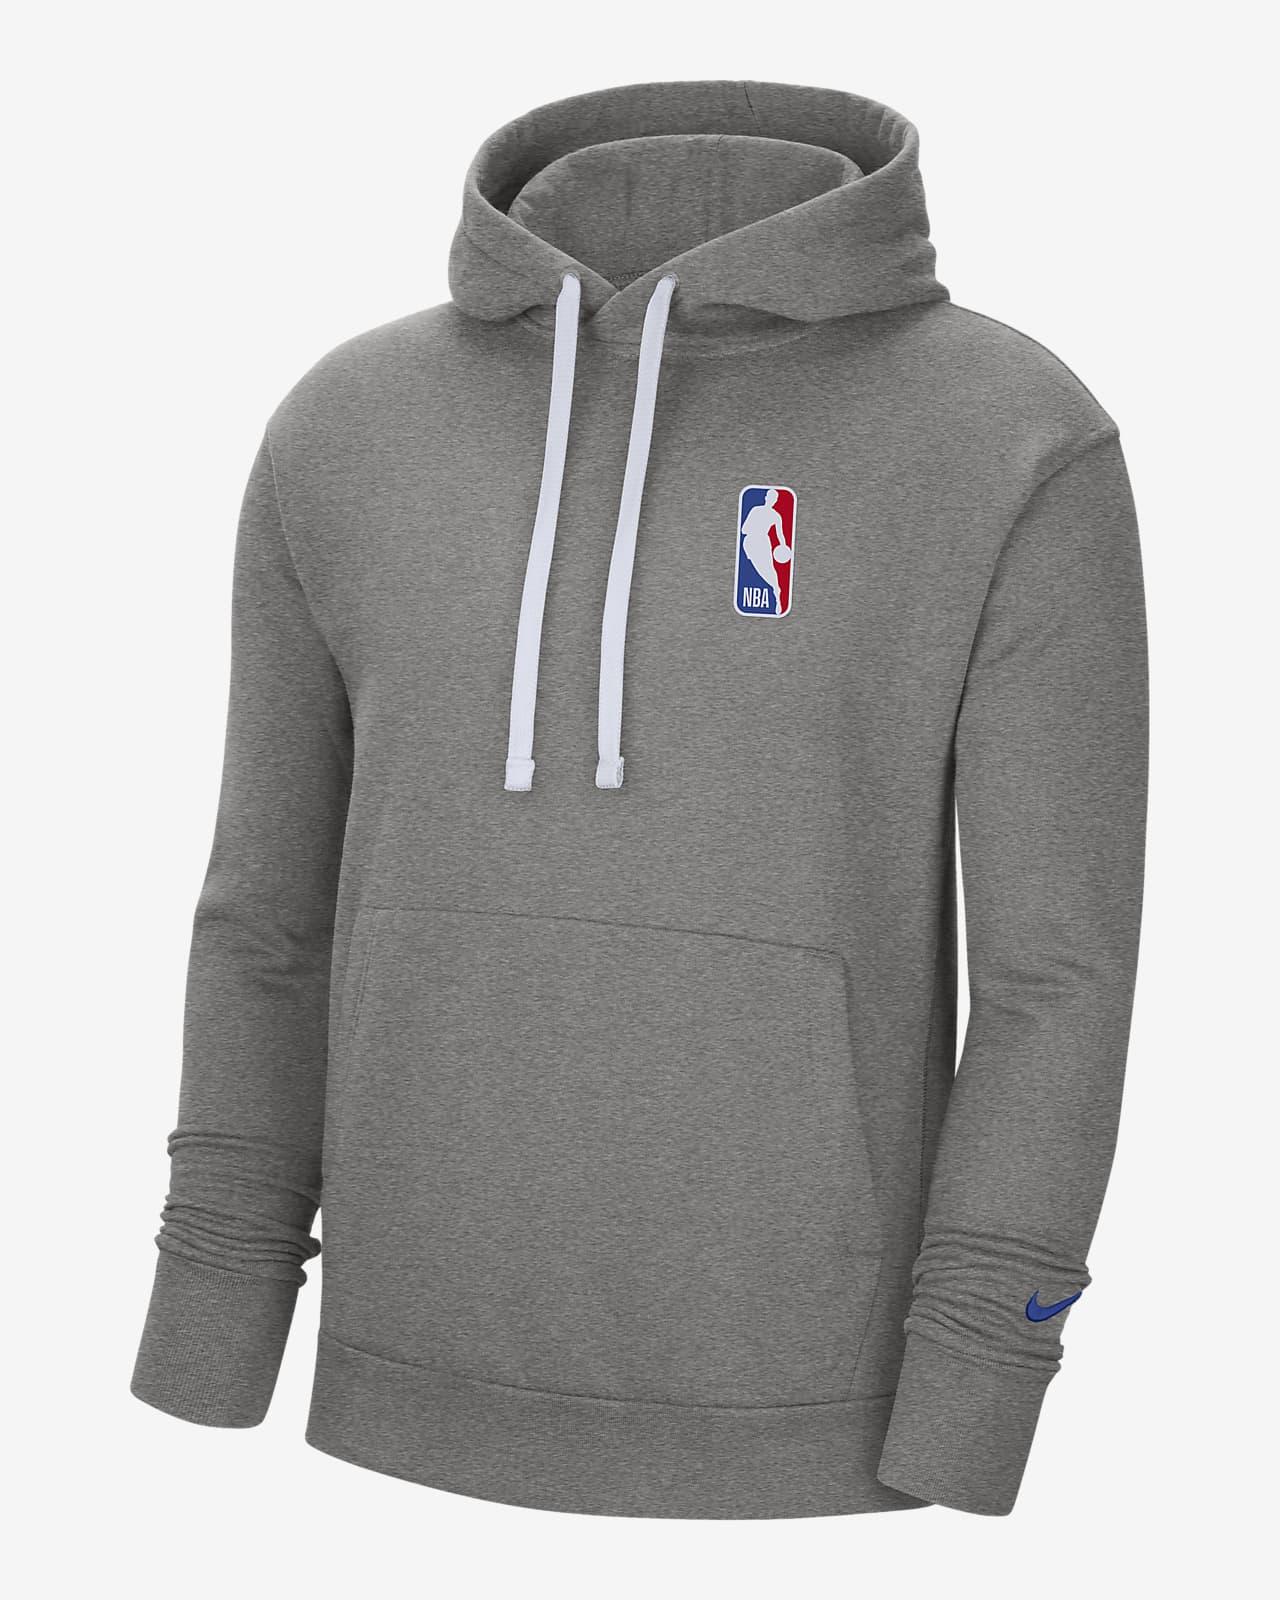 Team 31 Essential Nike NBA-Hoodie für Herren